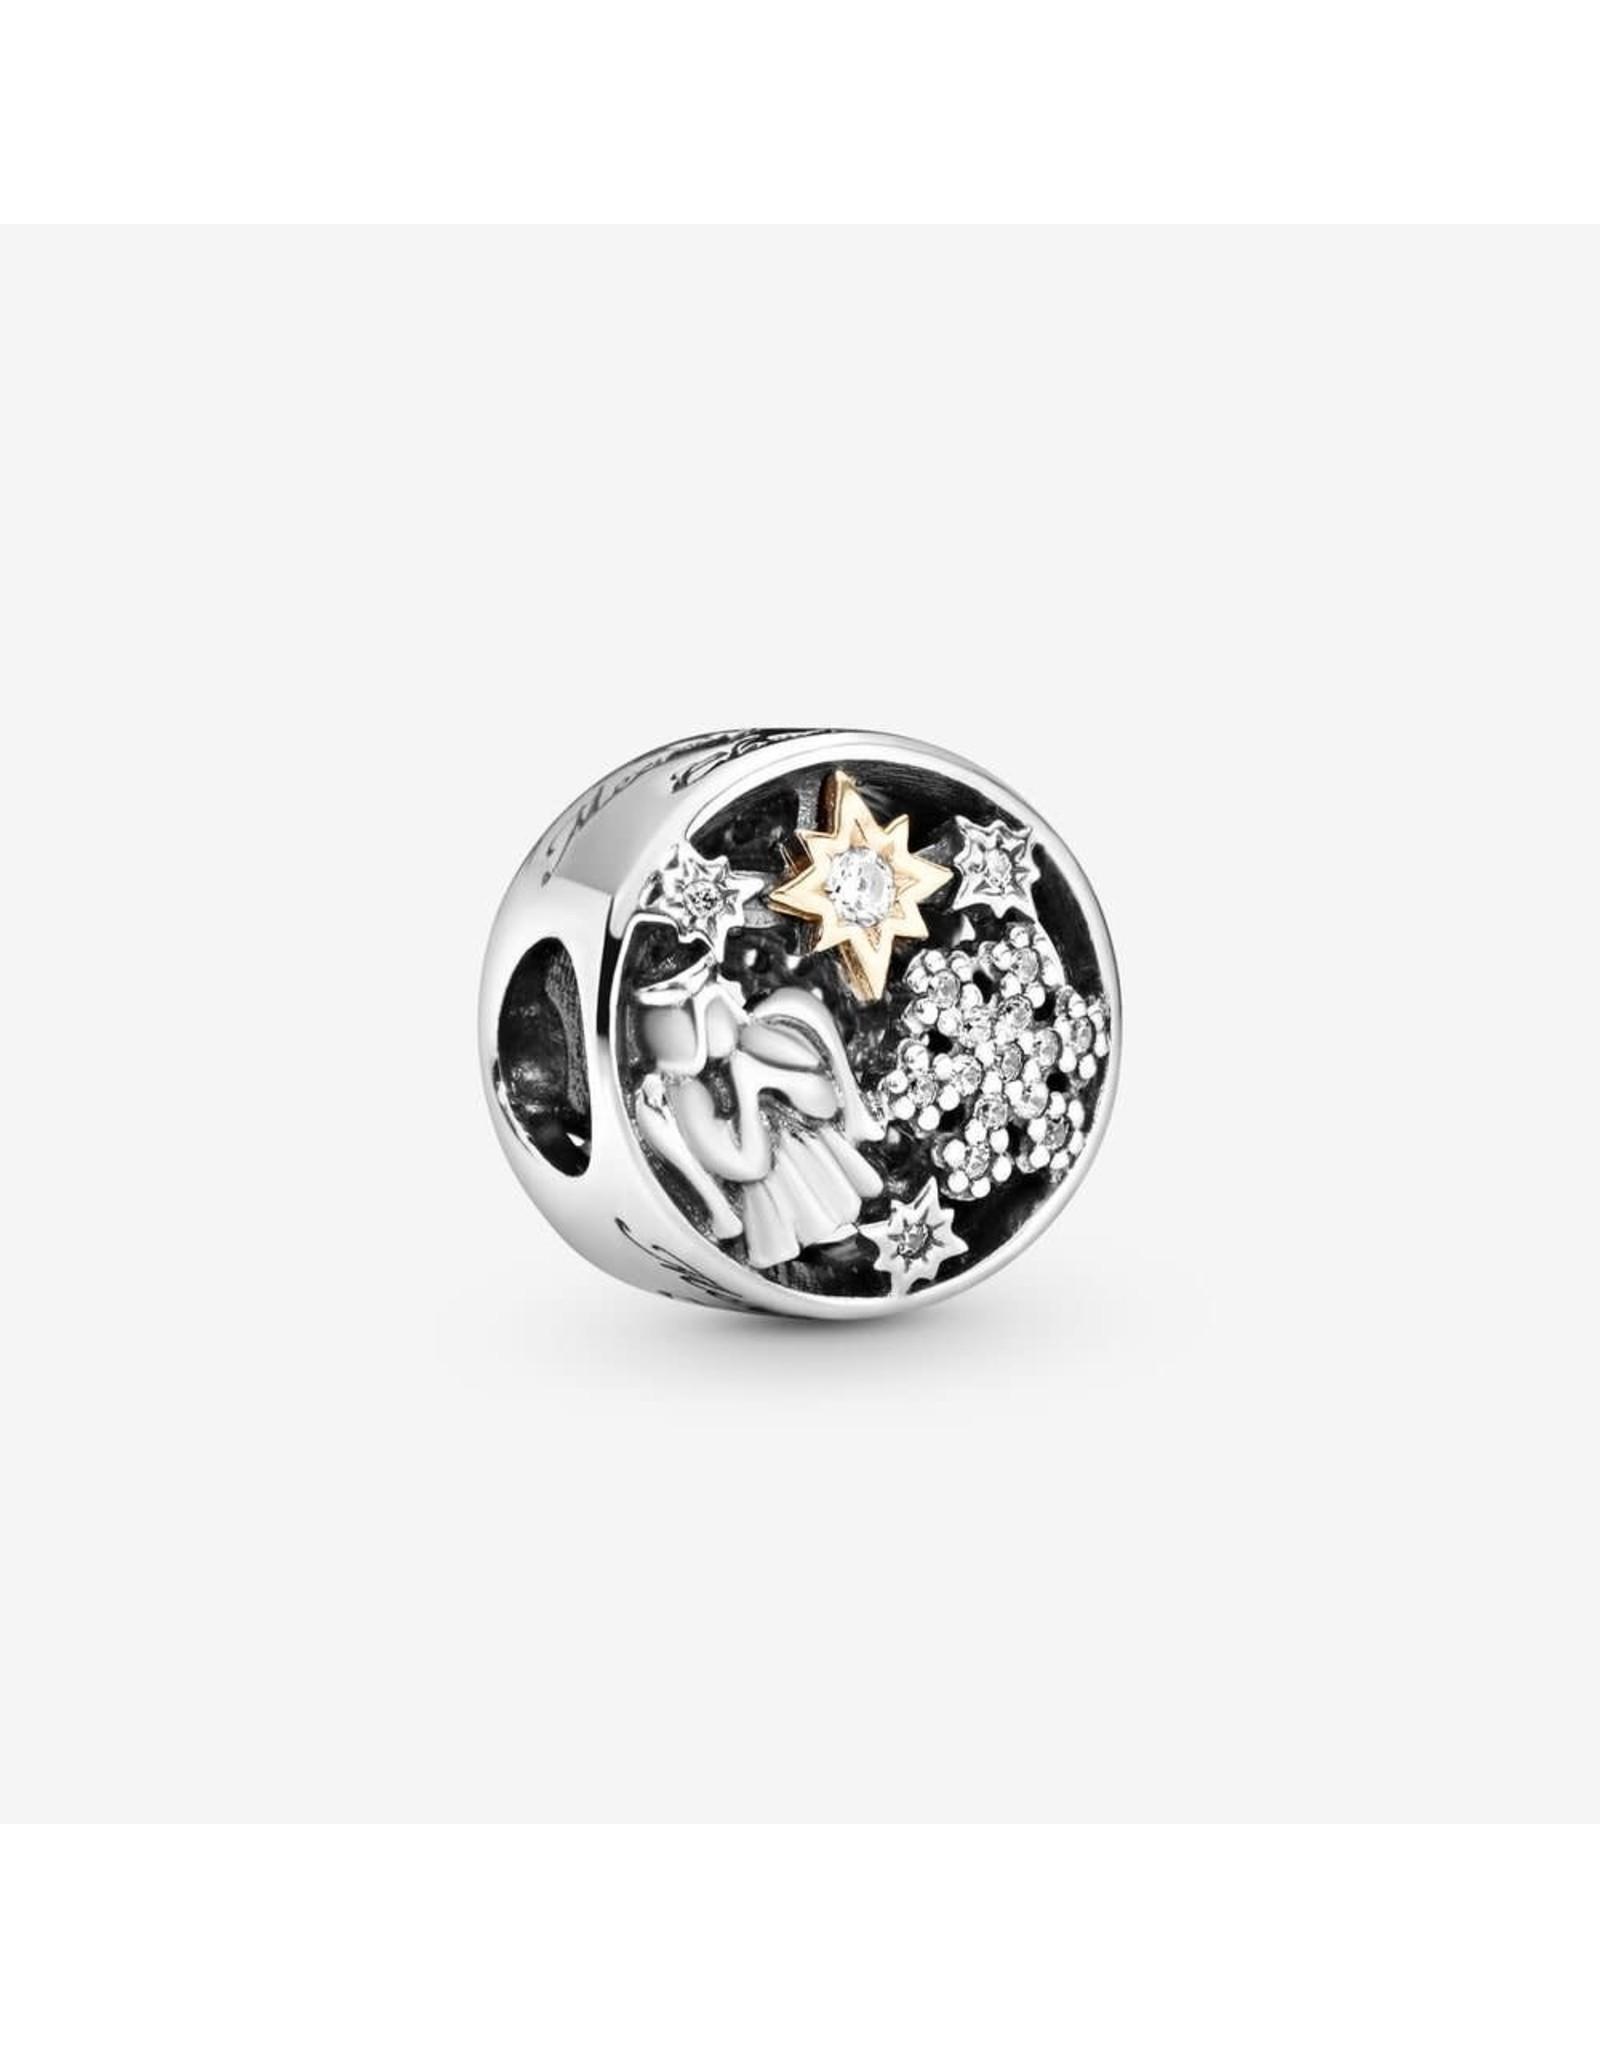 Pandora Pandora Charm, Celestial Wonders, Clear CZ